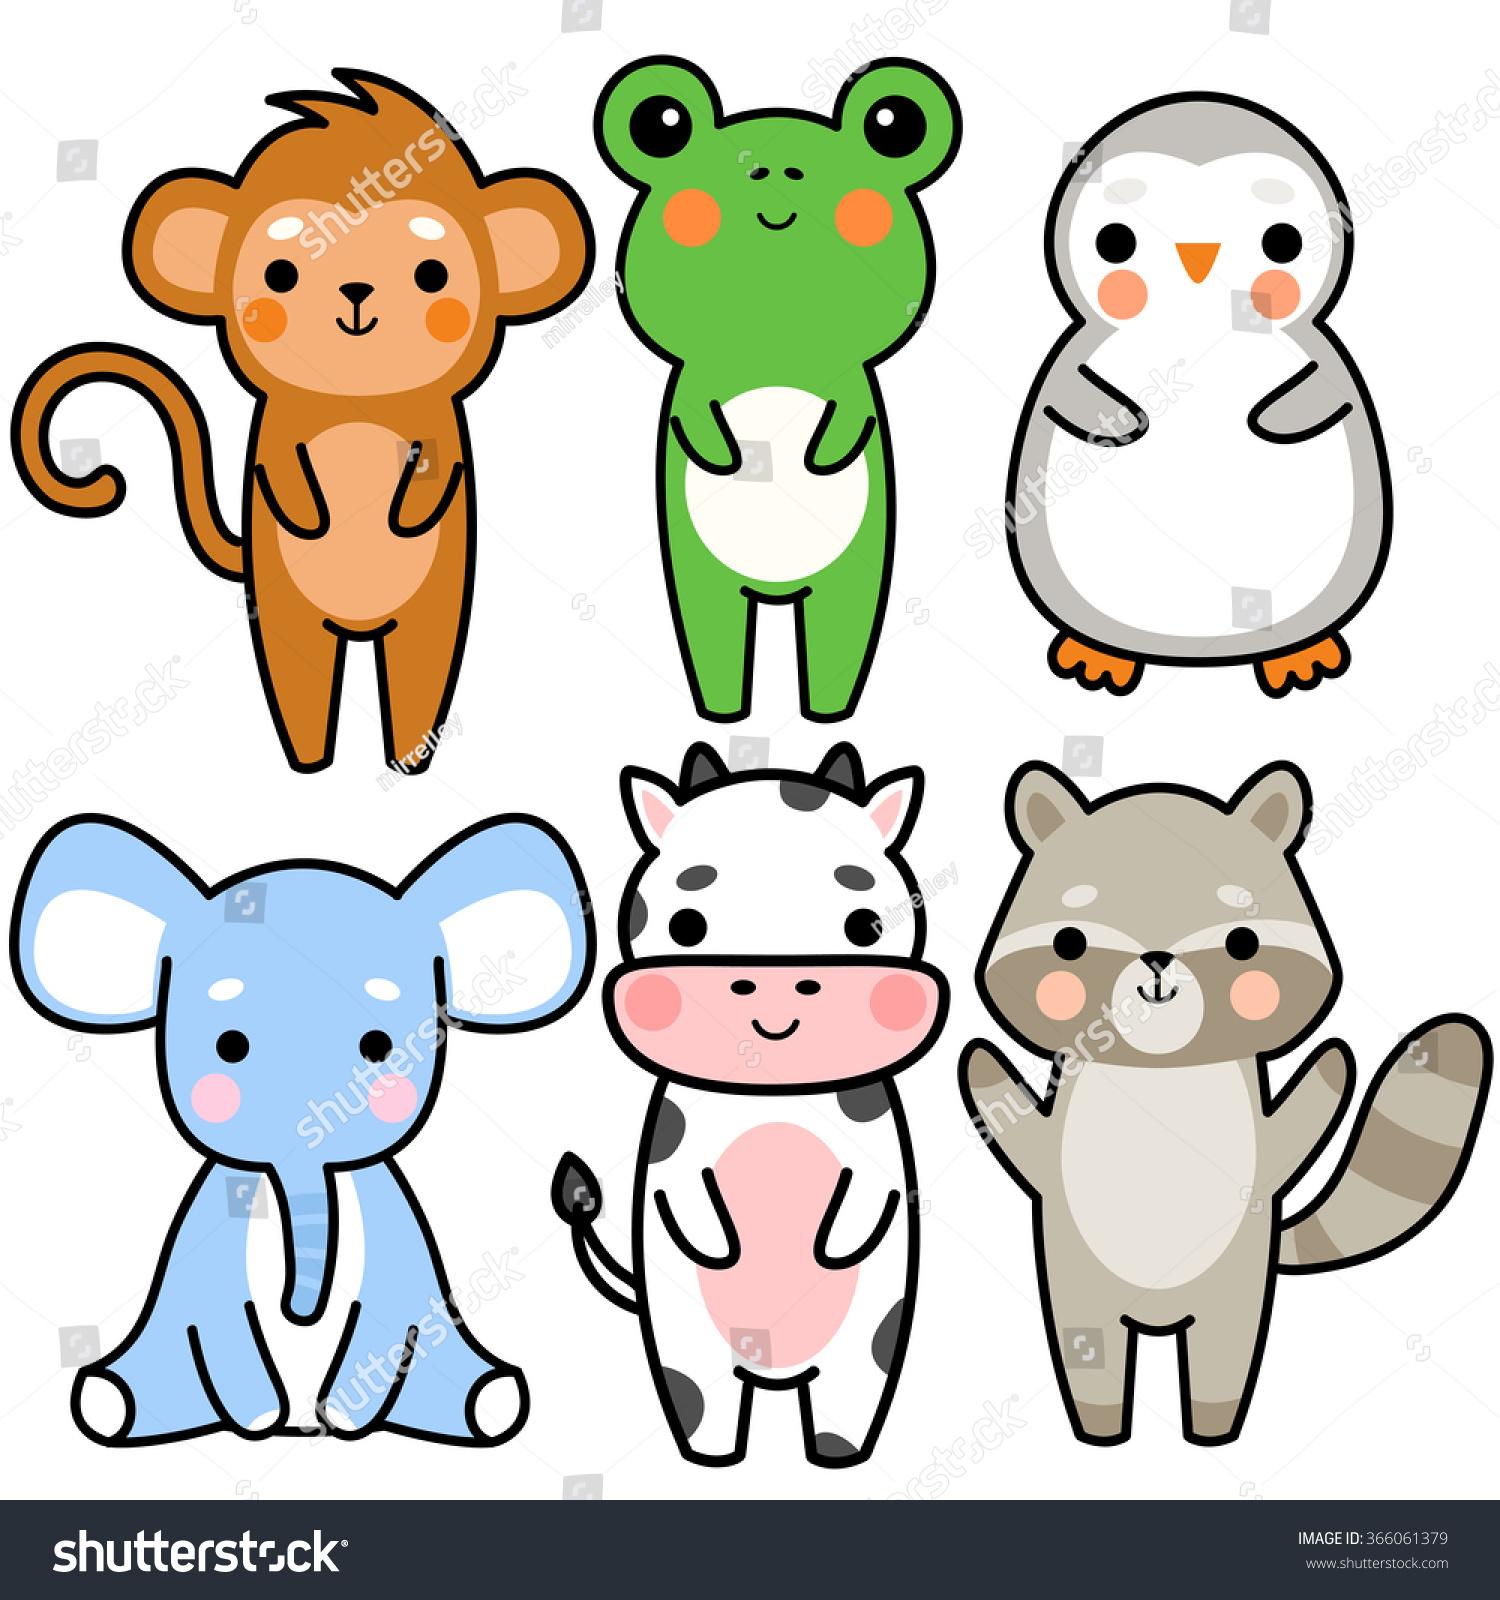 Set Six Illustration Cute Cartoon Baby Stock Vector (Royalty Free ...